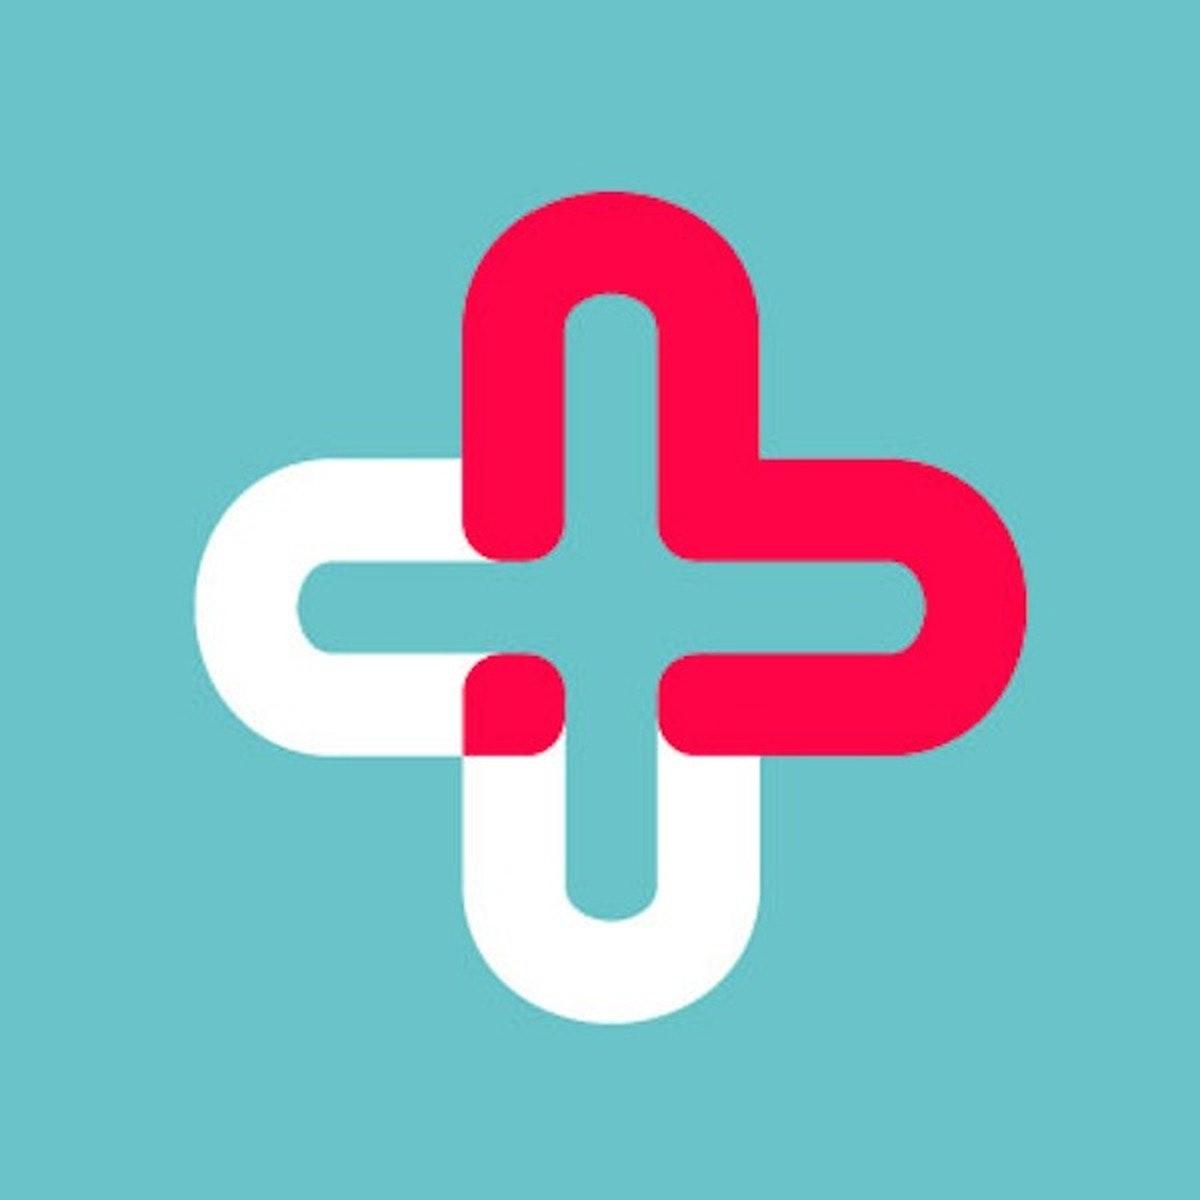 HRTBT Medical Solutions GmbH (Heartbeat Medical)